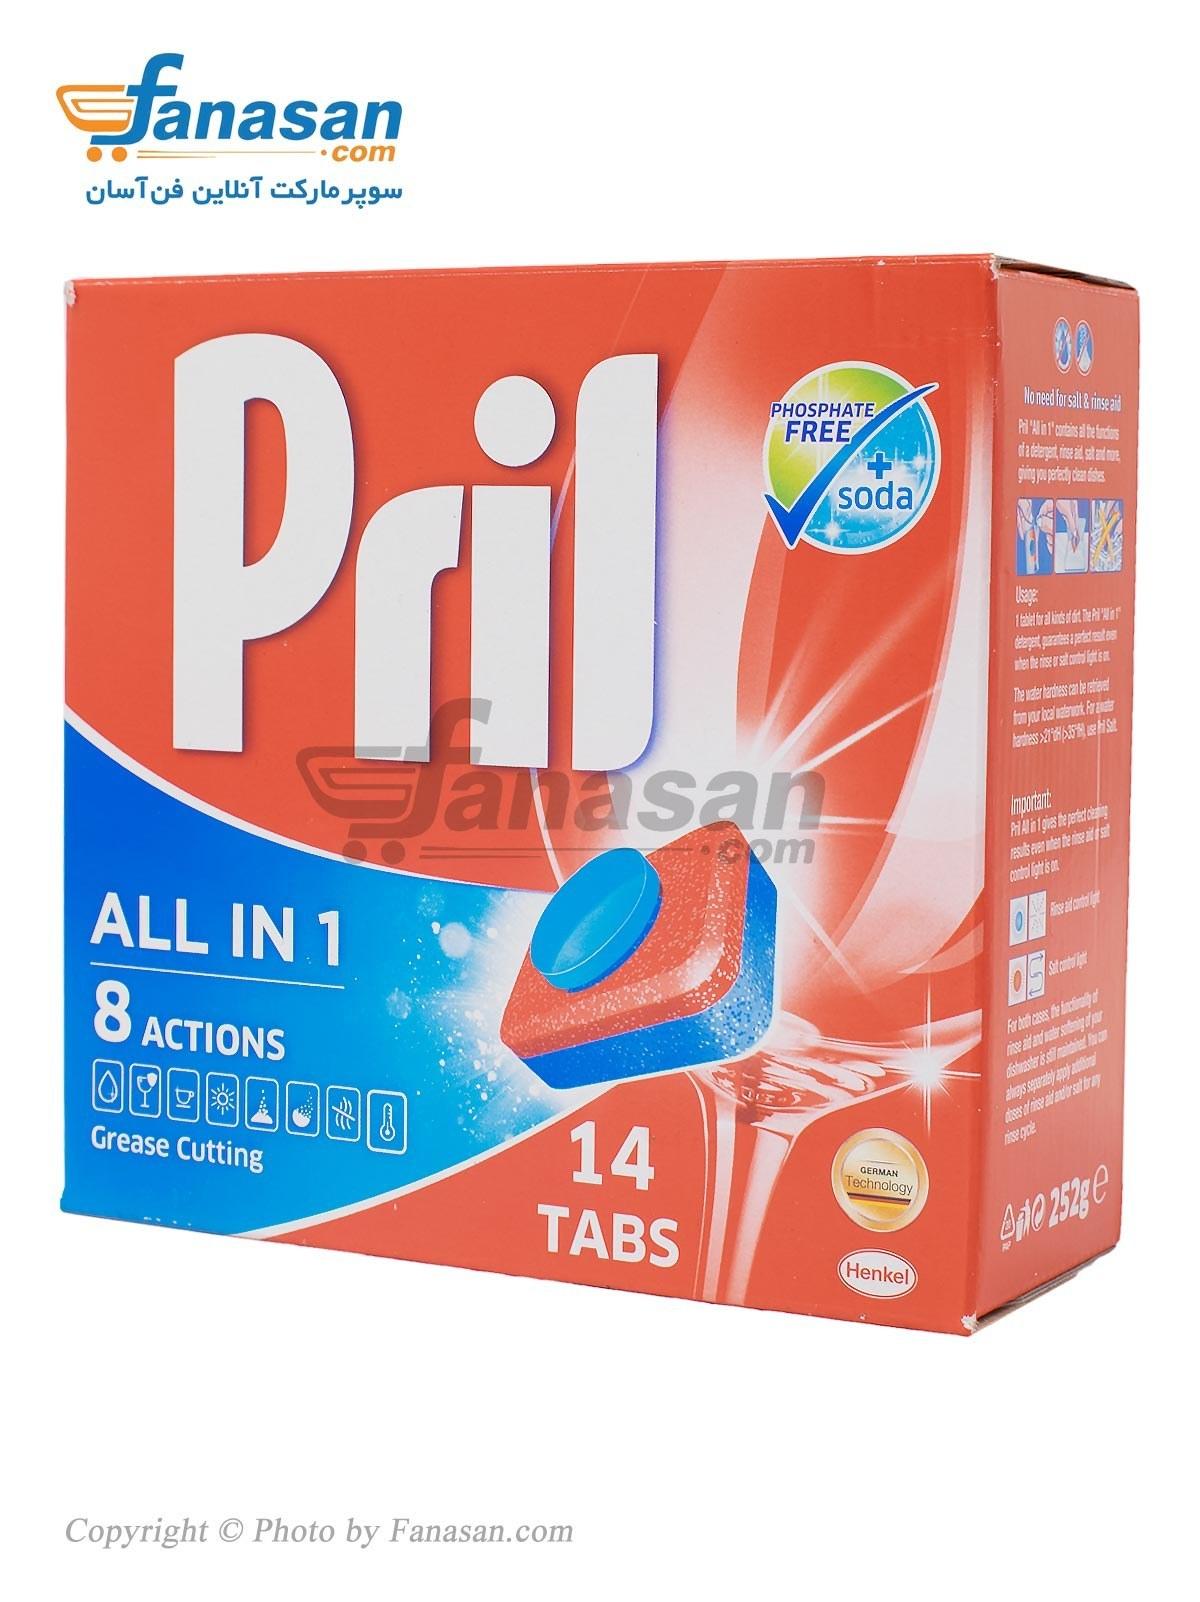 قرص ماشین ظرفشویی پریل بدون فسفات مدل all in 1 بسته 14 عددی | Pril All In 1 Dishwasher Tablets Pack Of 14